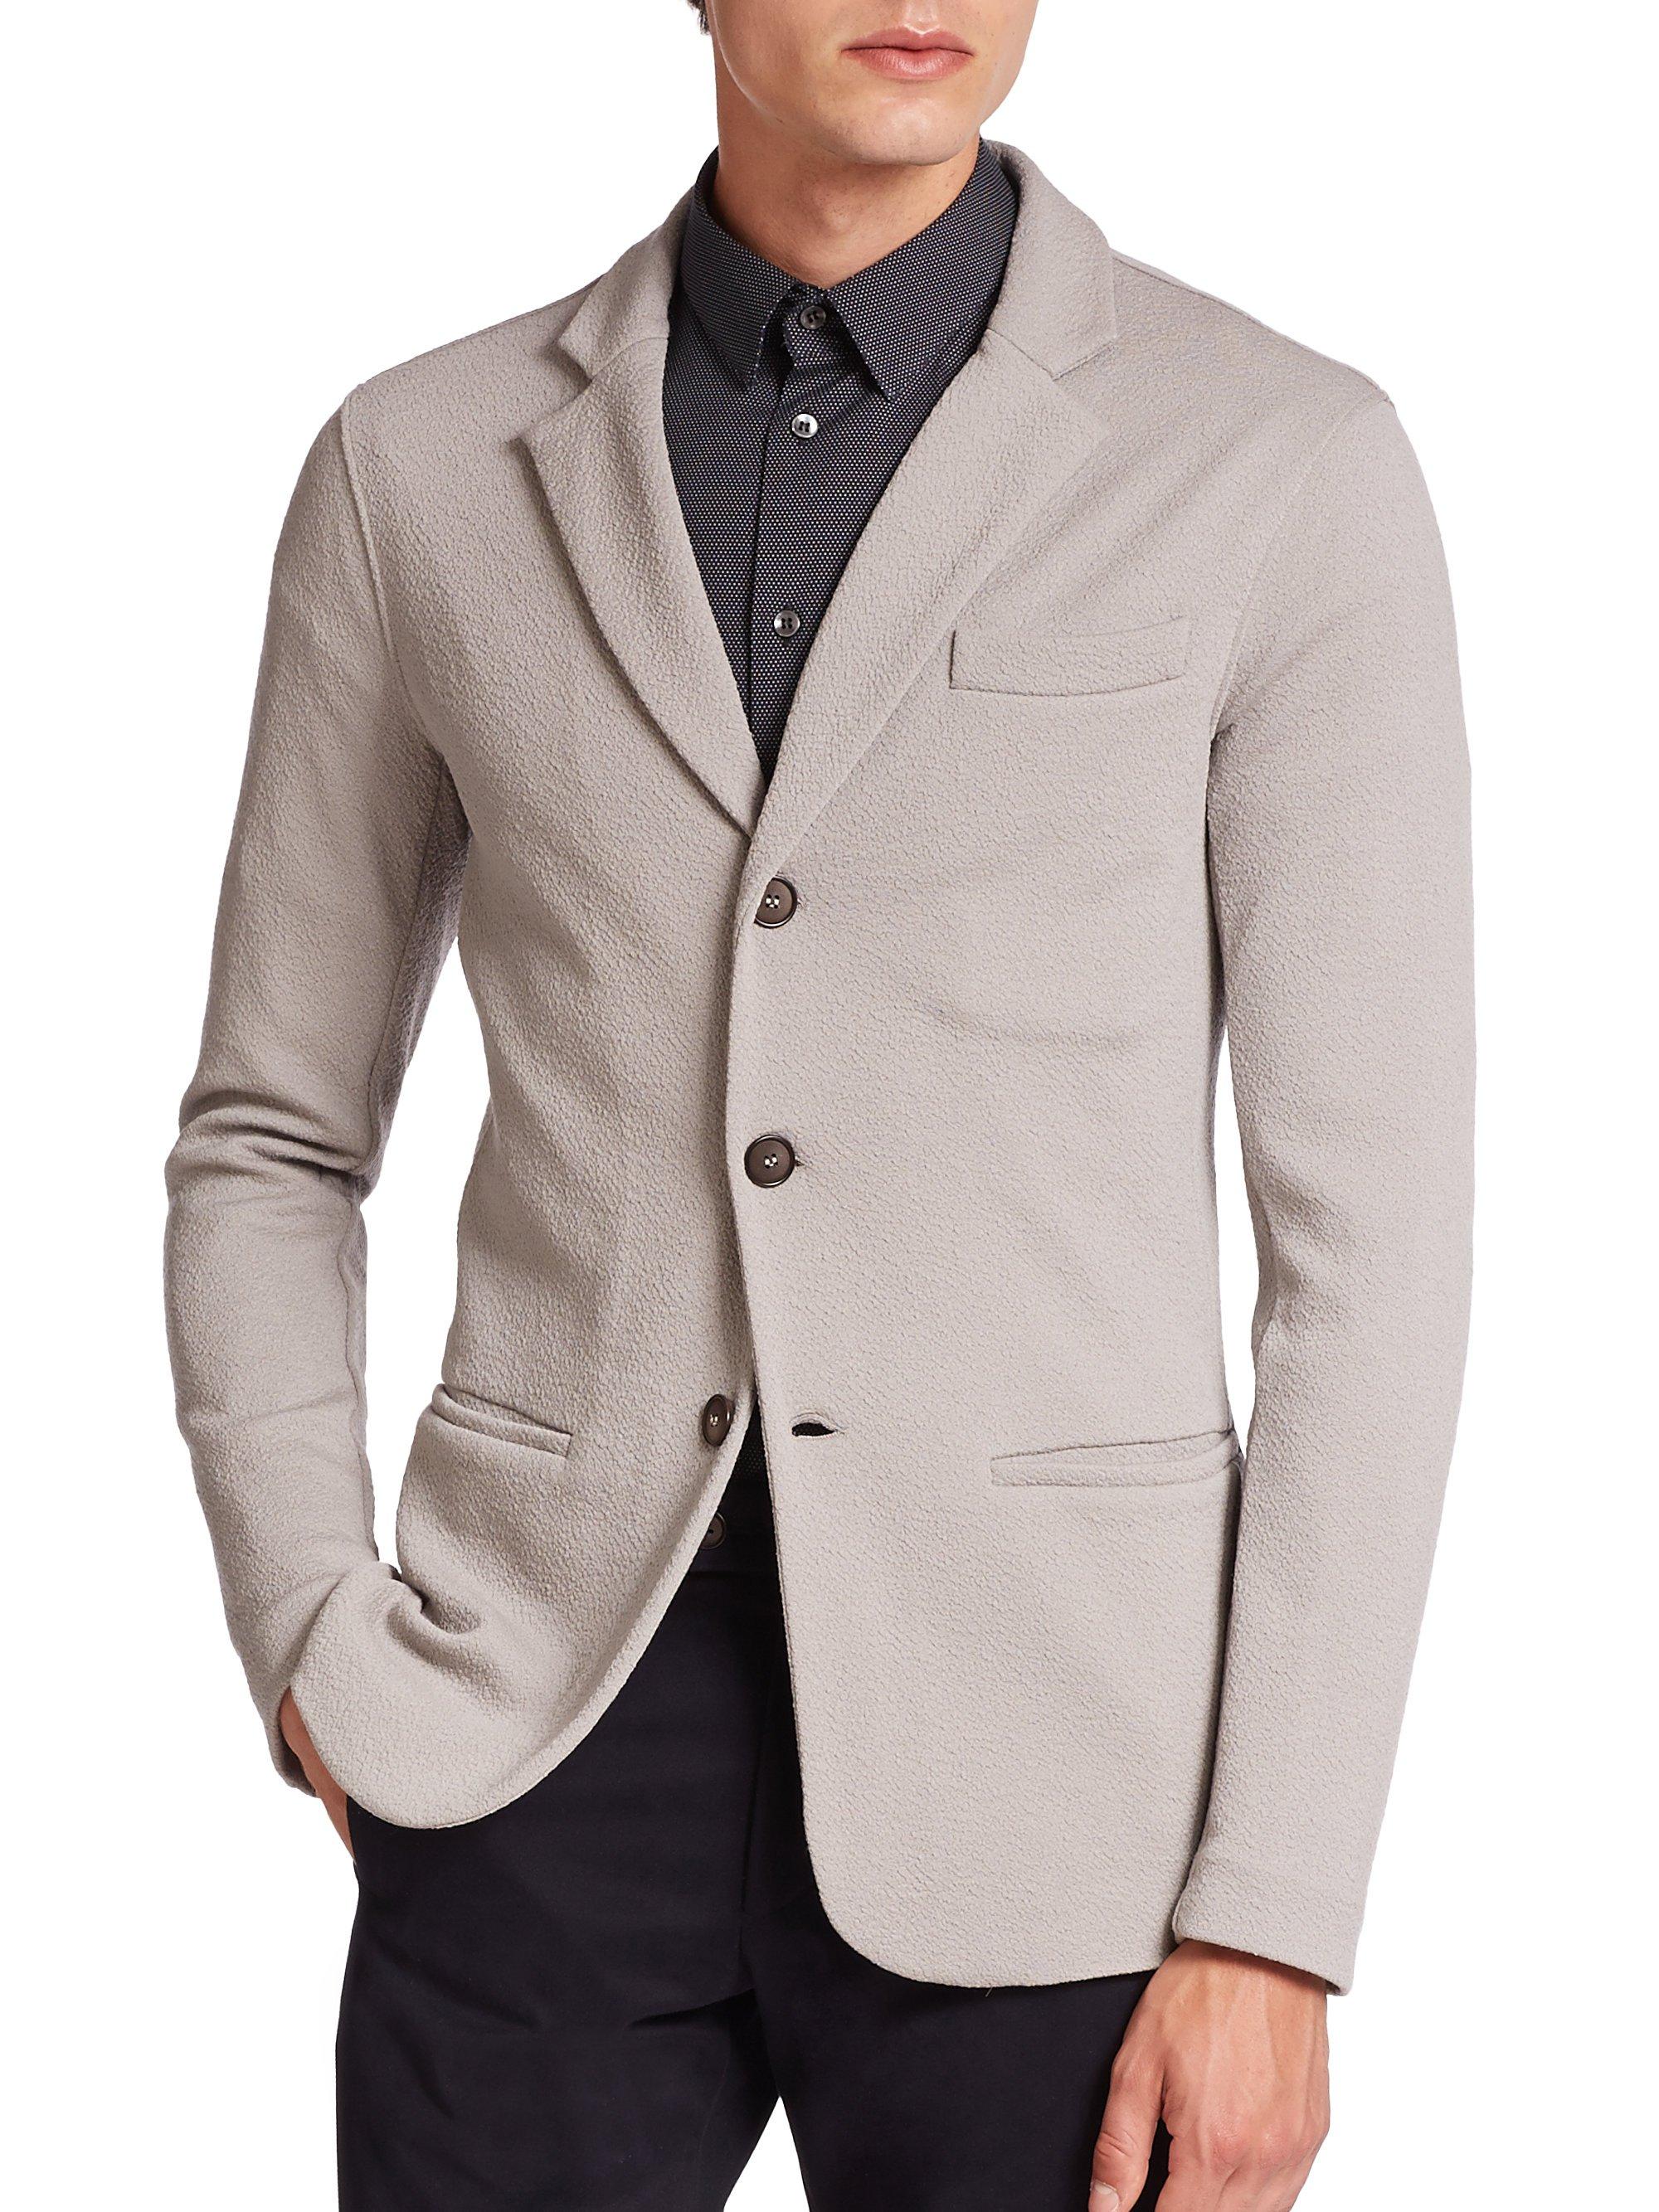 Lyst Giorgio Armani Textured Wool Blazer In Gray For Men